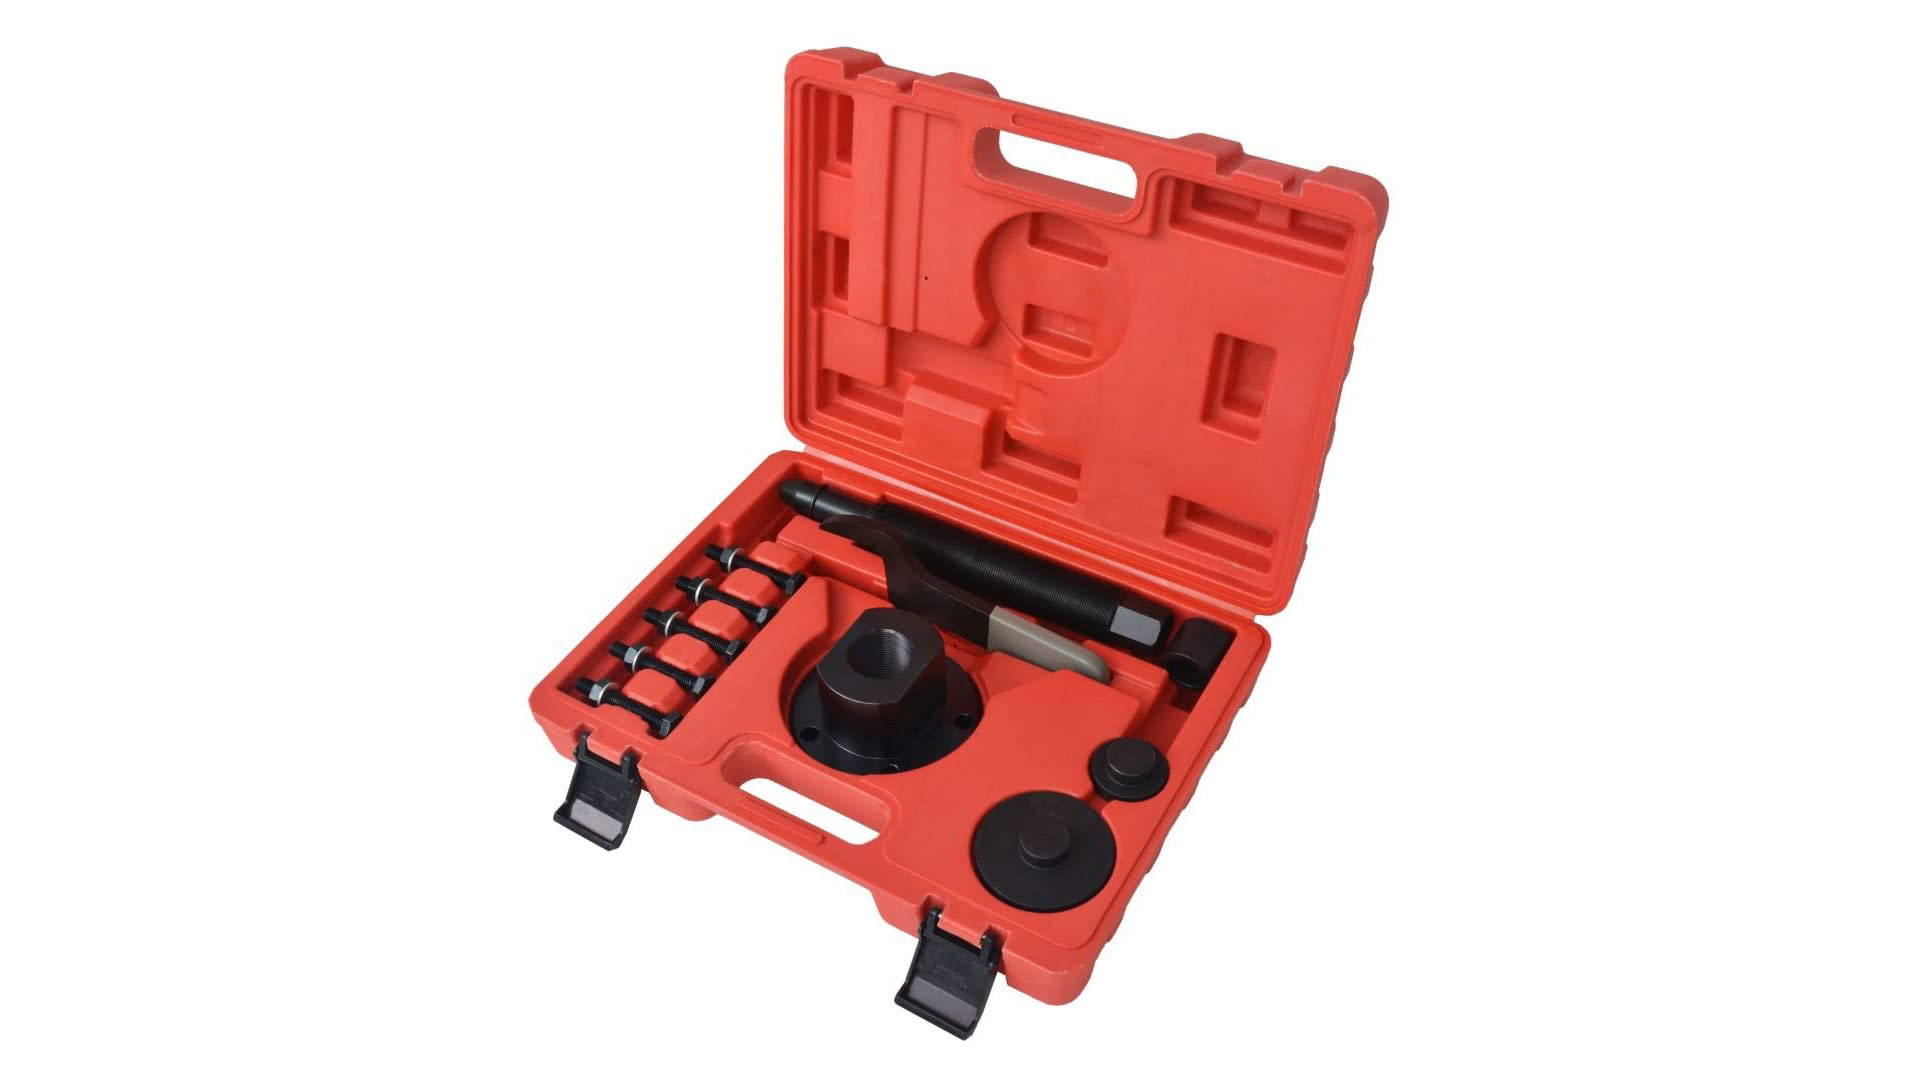 vidaxl 210416 front wheel bearing tool